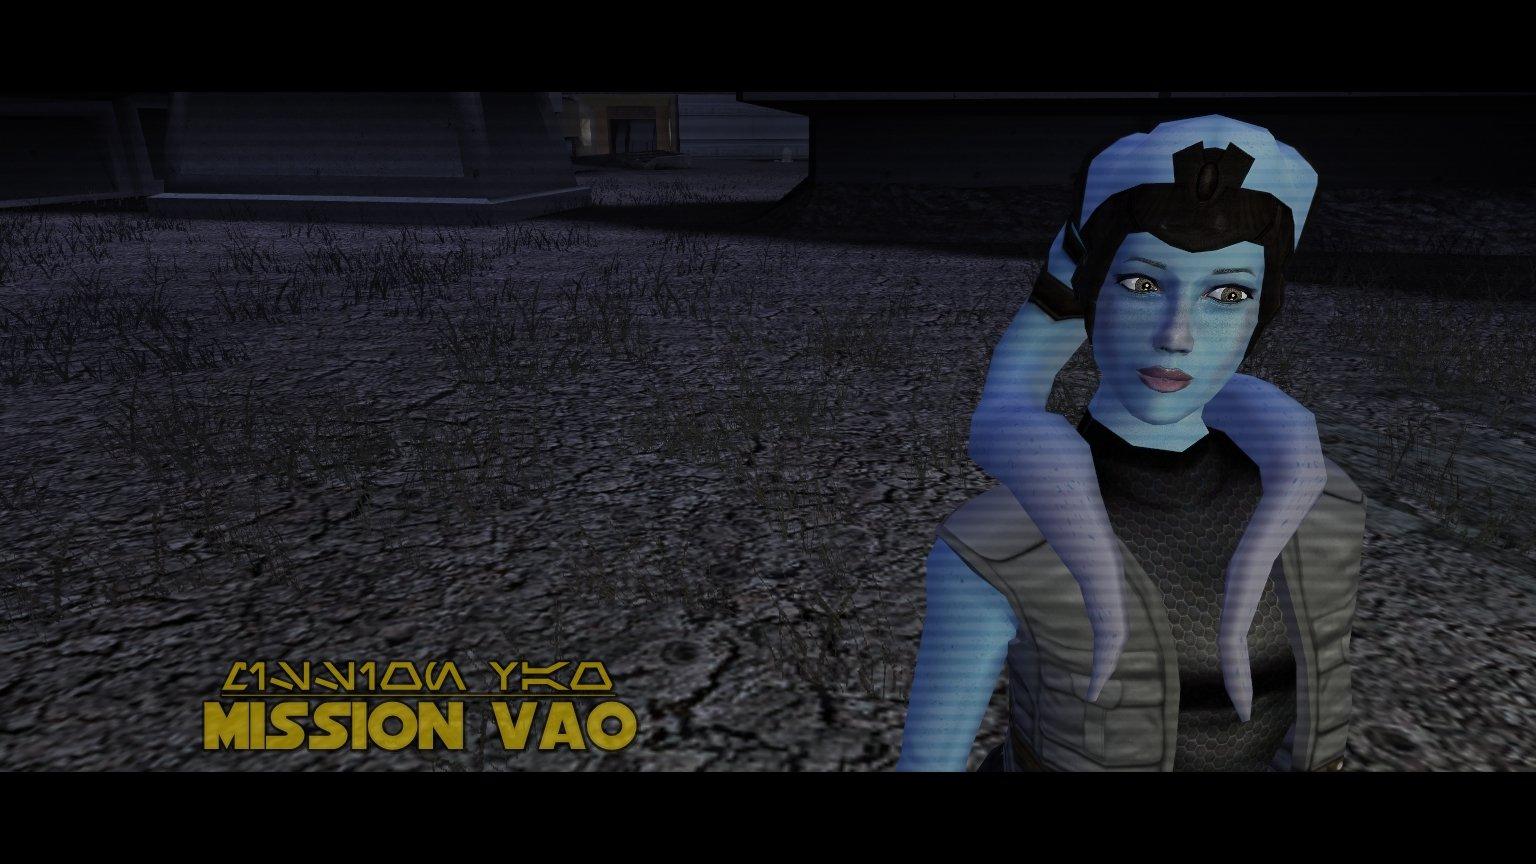 The Companions: Mission Vao